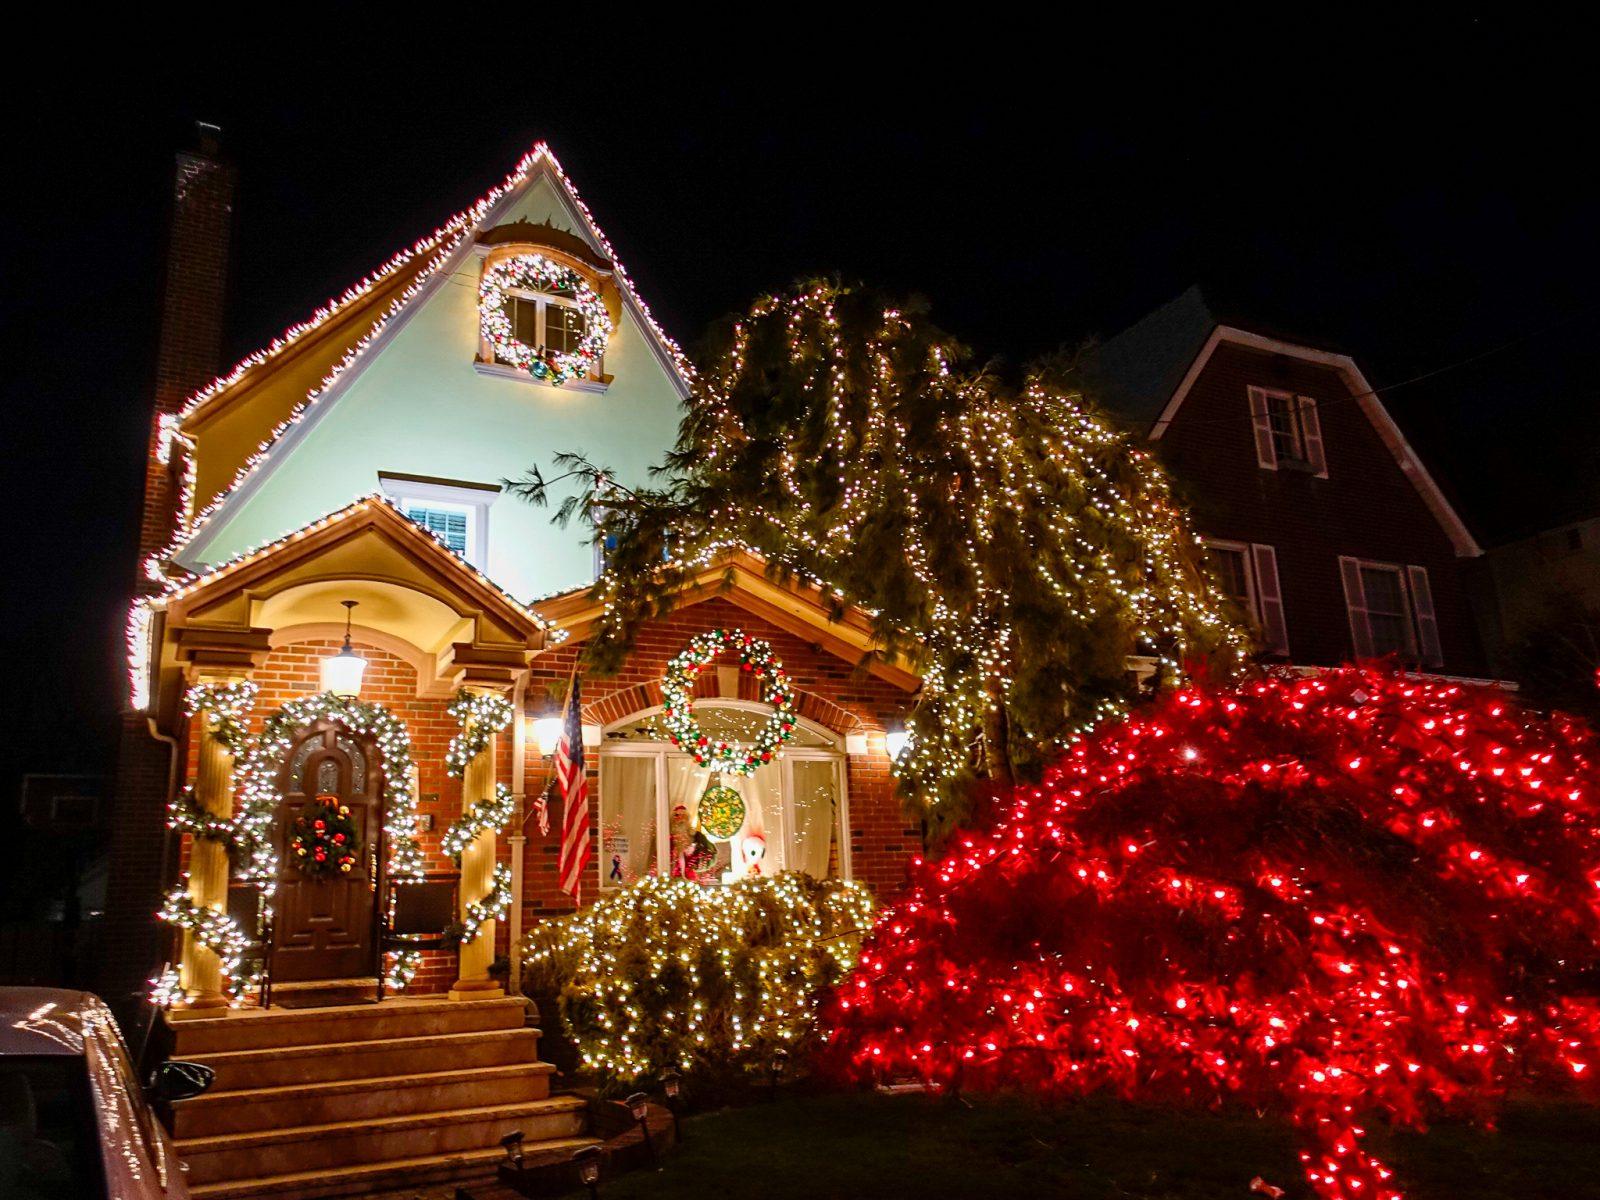 julepyntet hus i usa